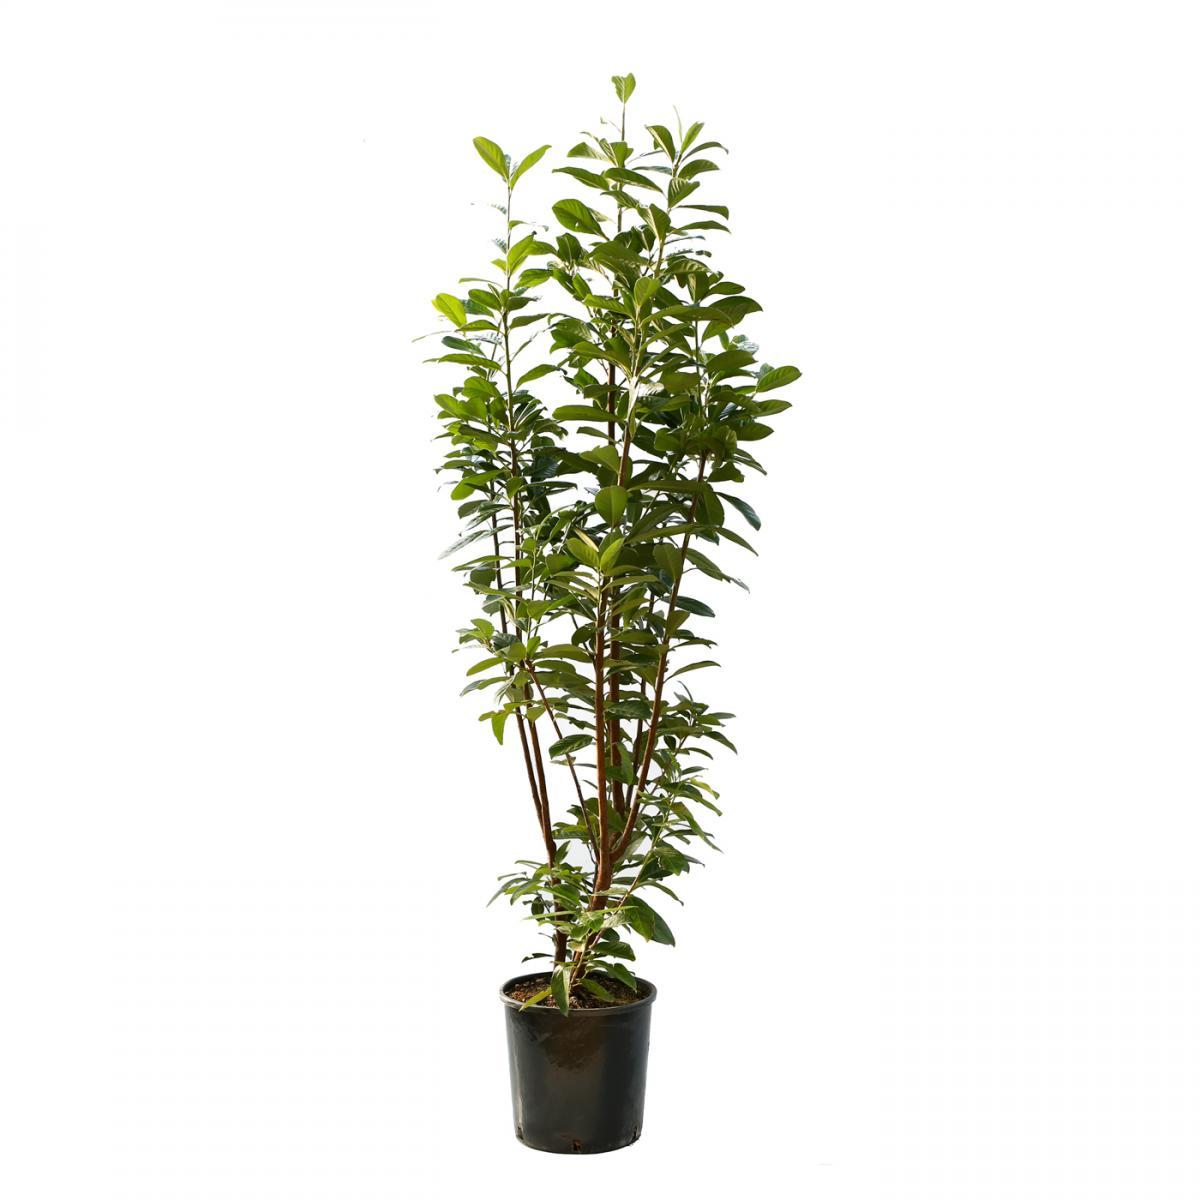 prunus laurocerasus novita cherry laurel bush 18l 125 150cm clifton nurseries. Black Bedroom Furniture Sets. Home Design Ideas